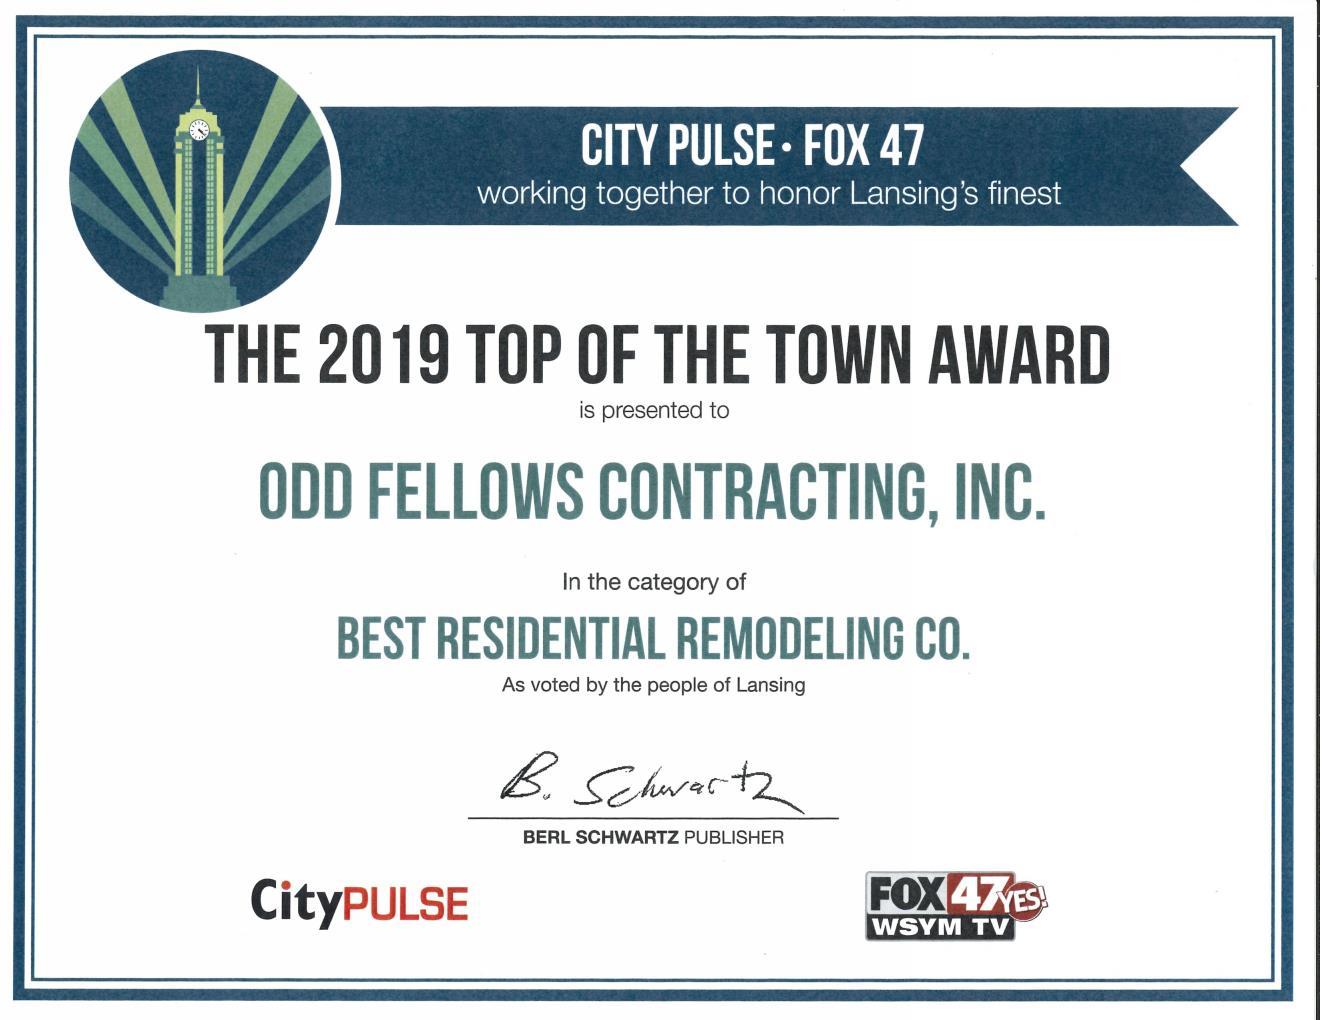 City-Pulse-Remodeling-Award